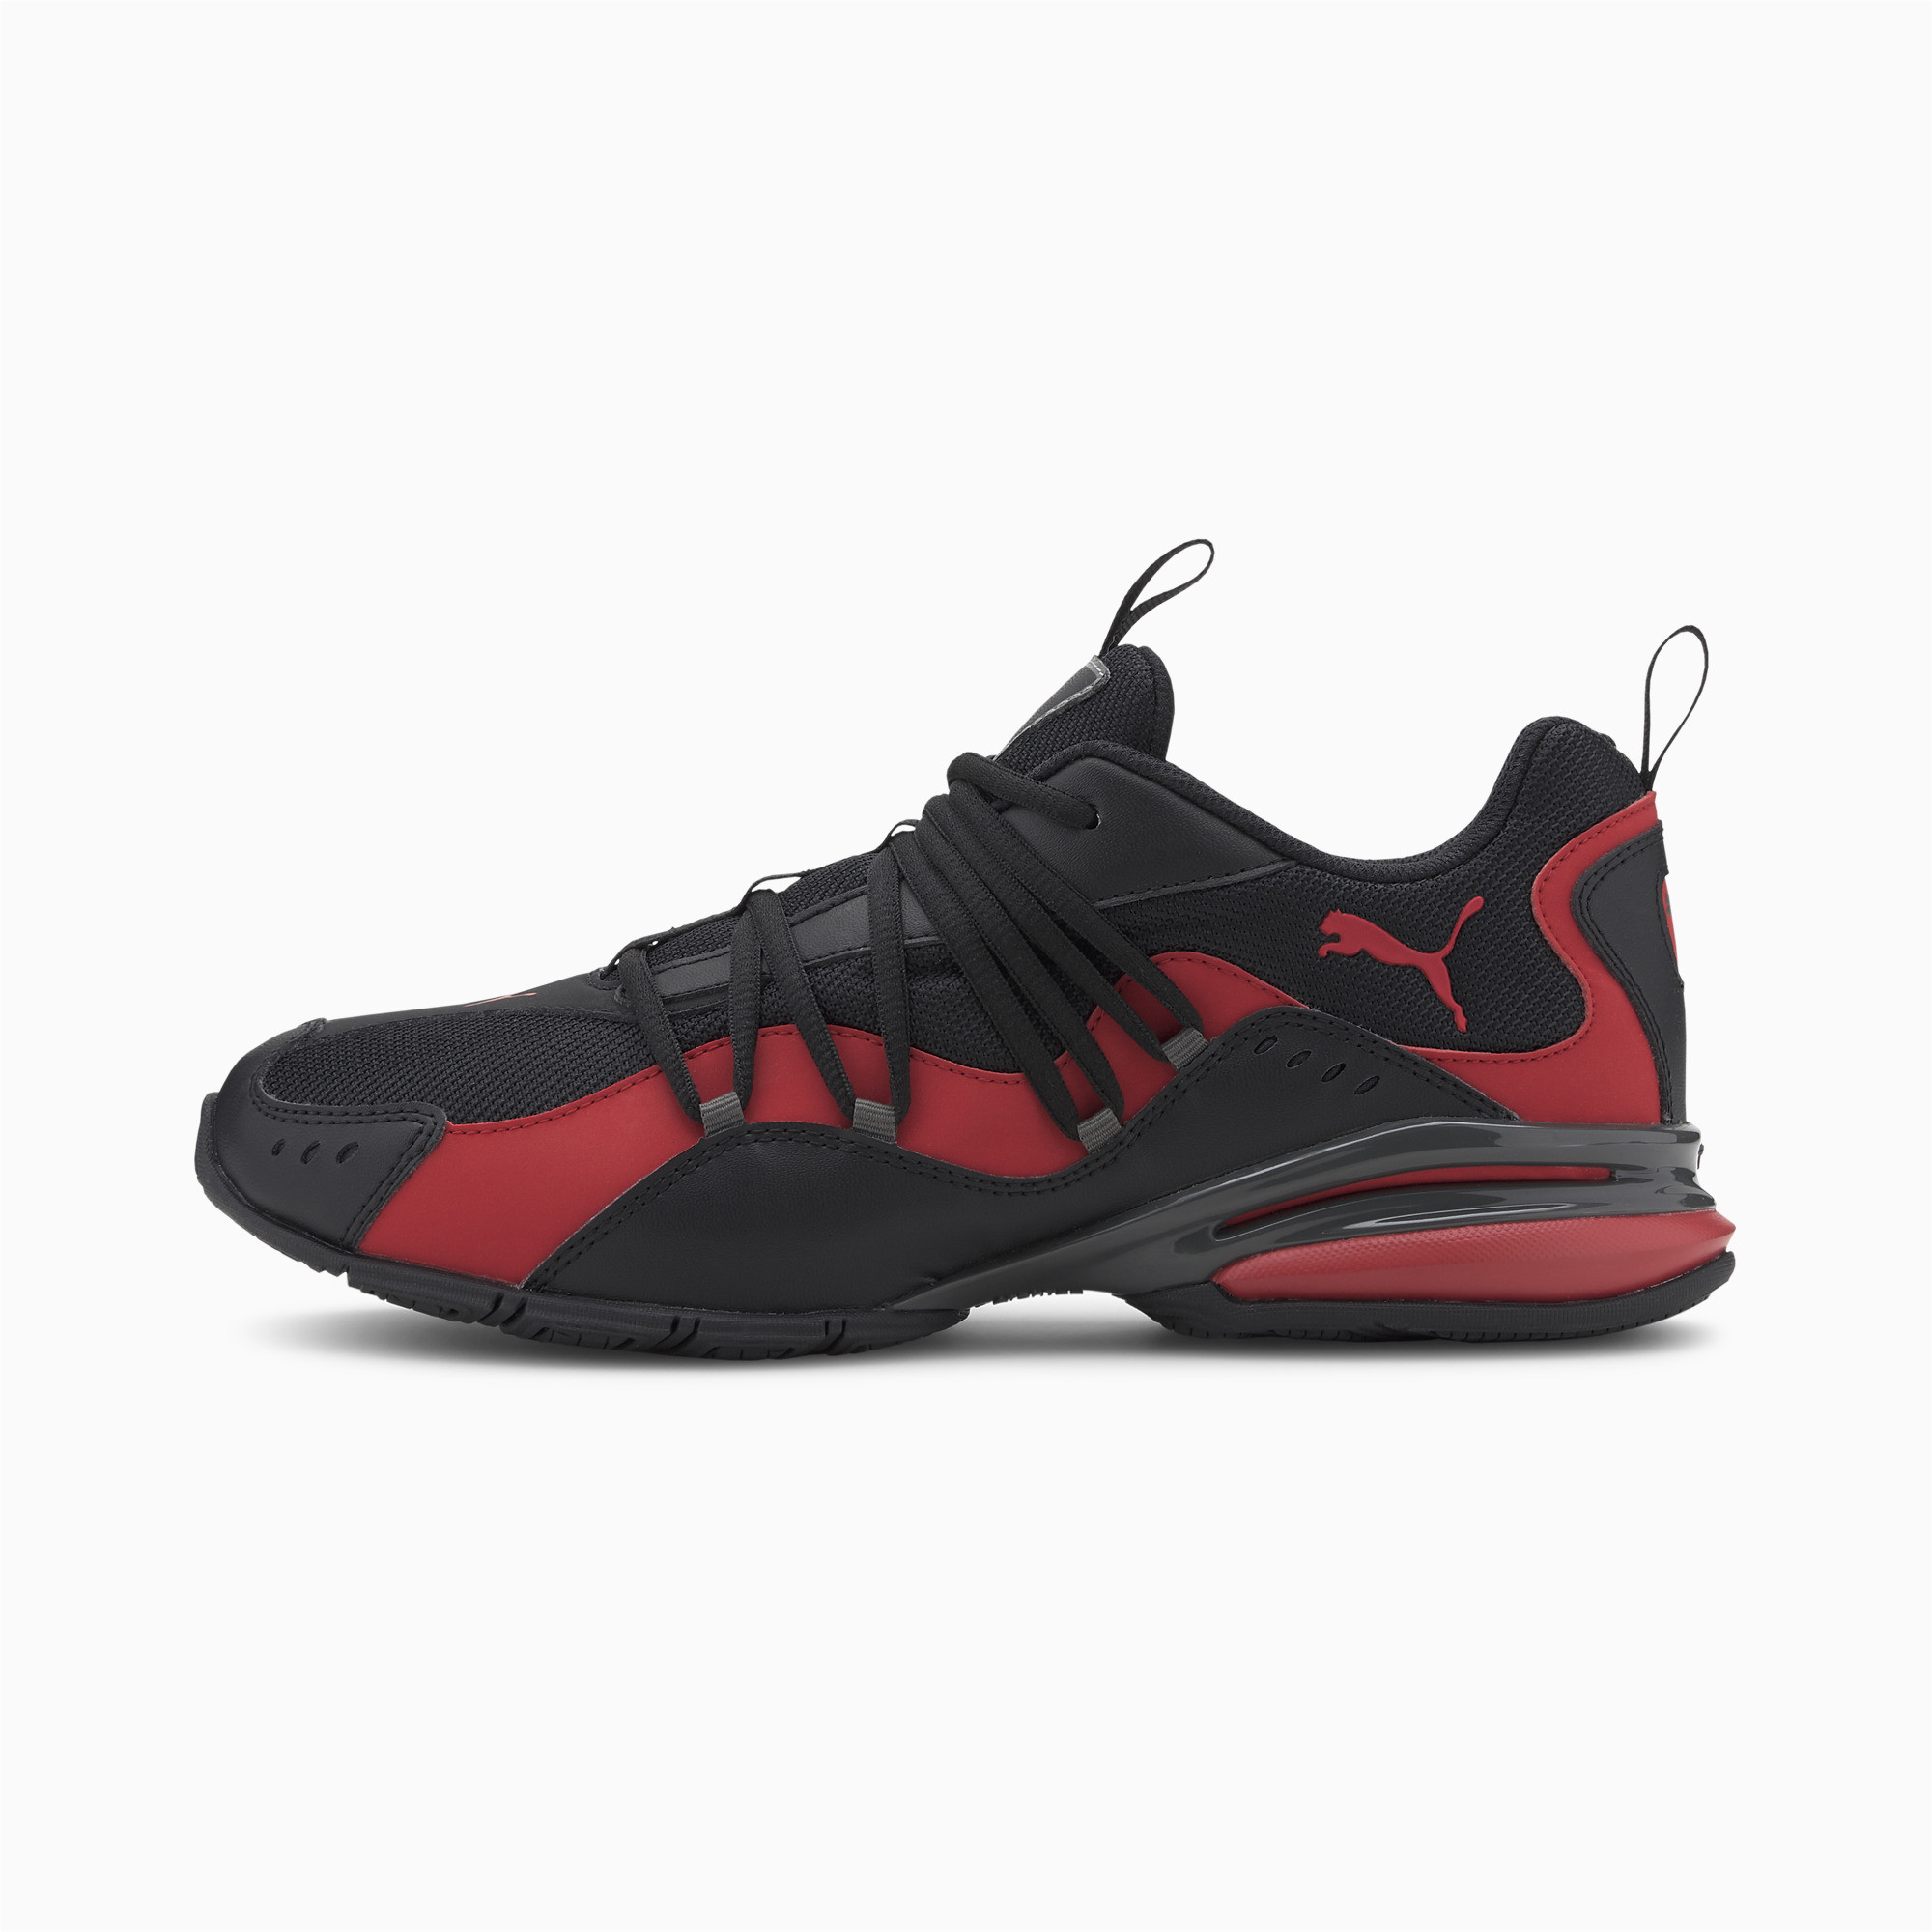 PUMA-Silverion-Men-s-Running-Shoes-Men-Shoe-Running thumbnail 14